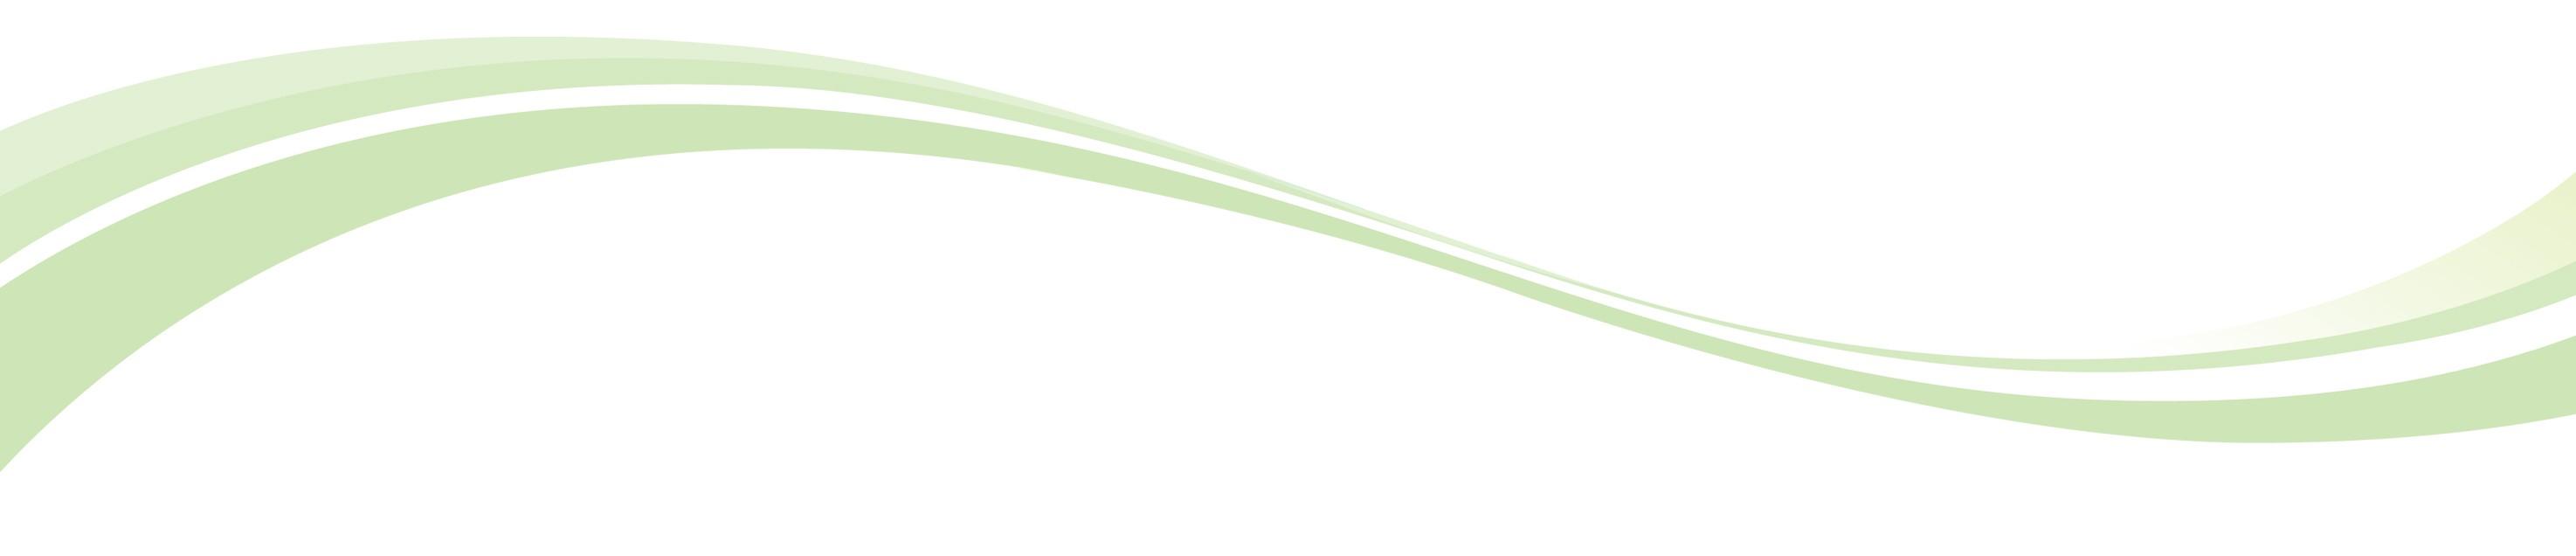 Tri-State Light & Energy, Inc  | LinkedIn